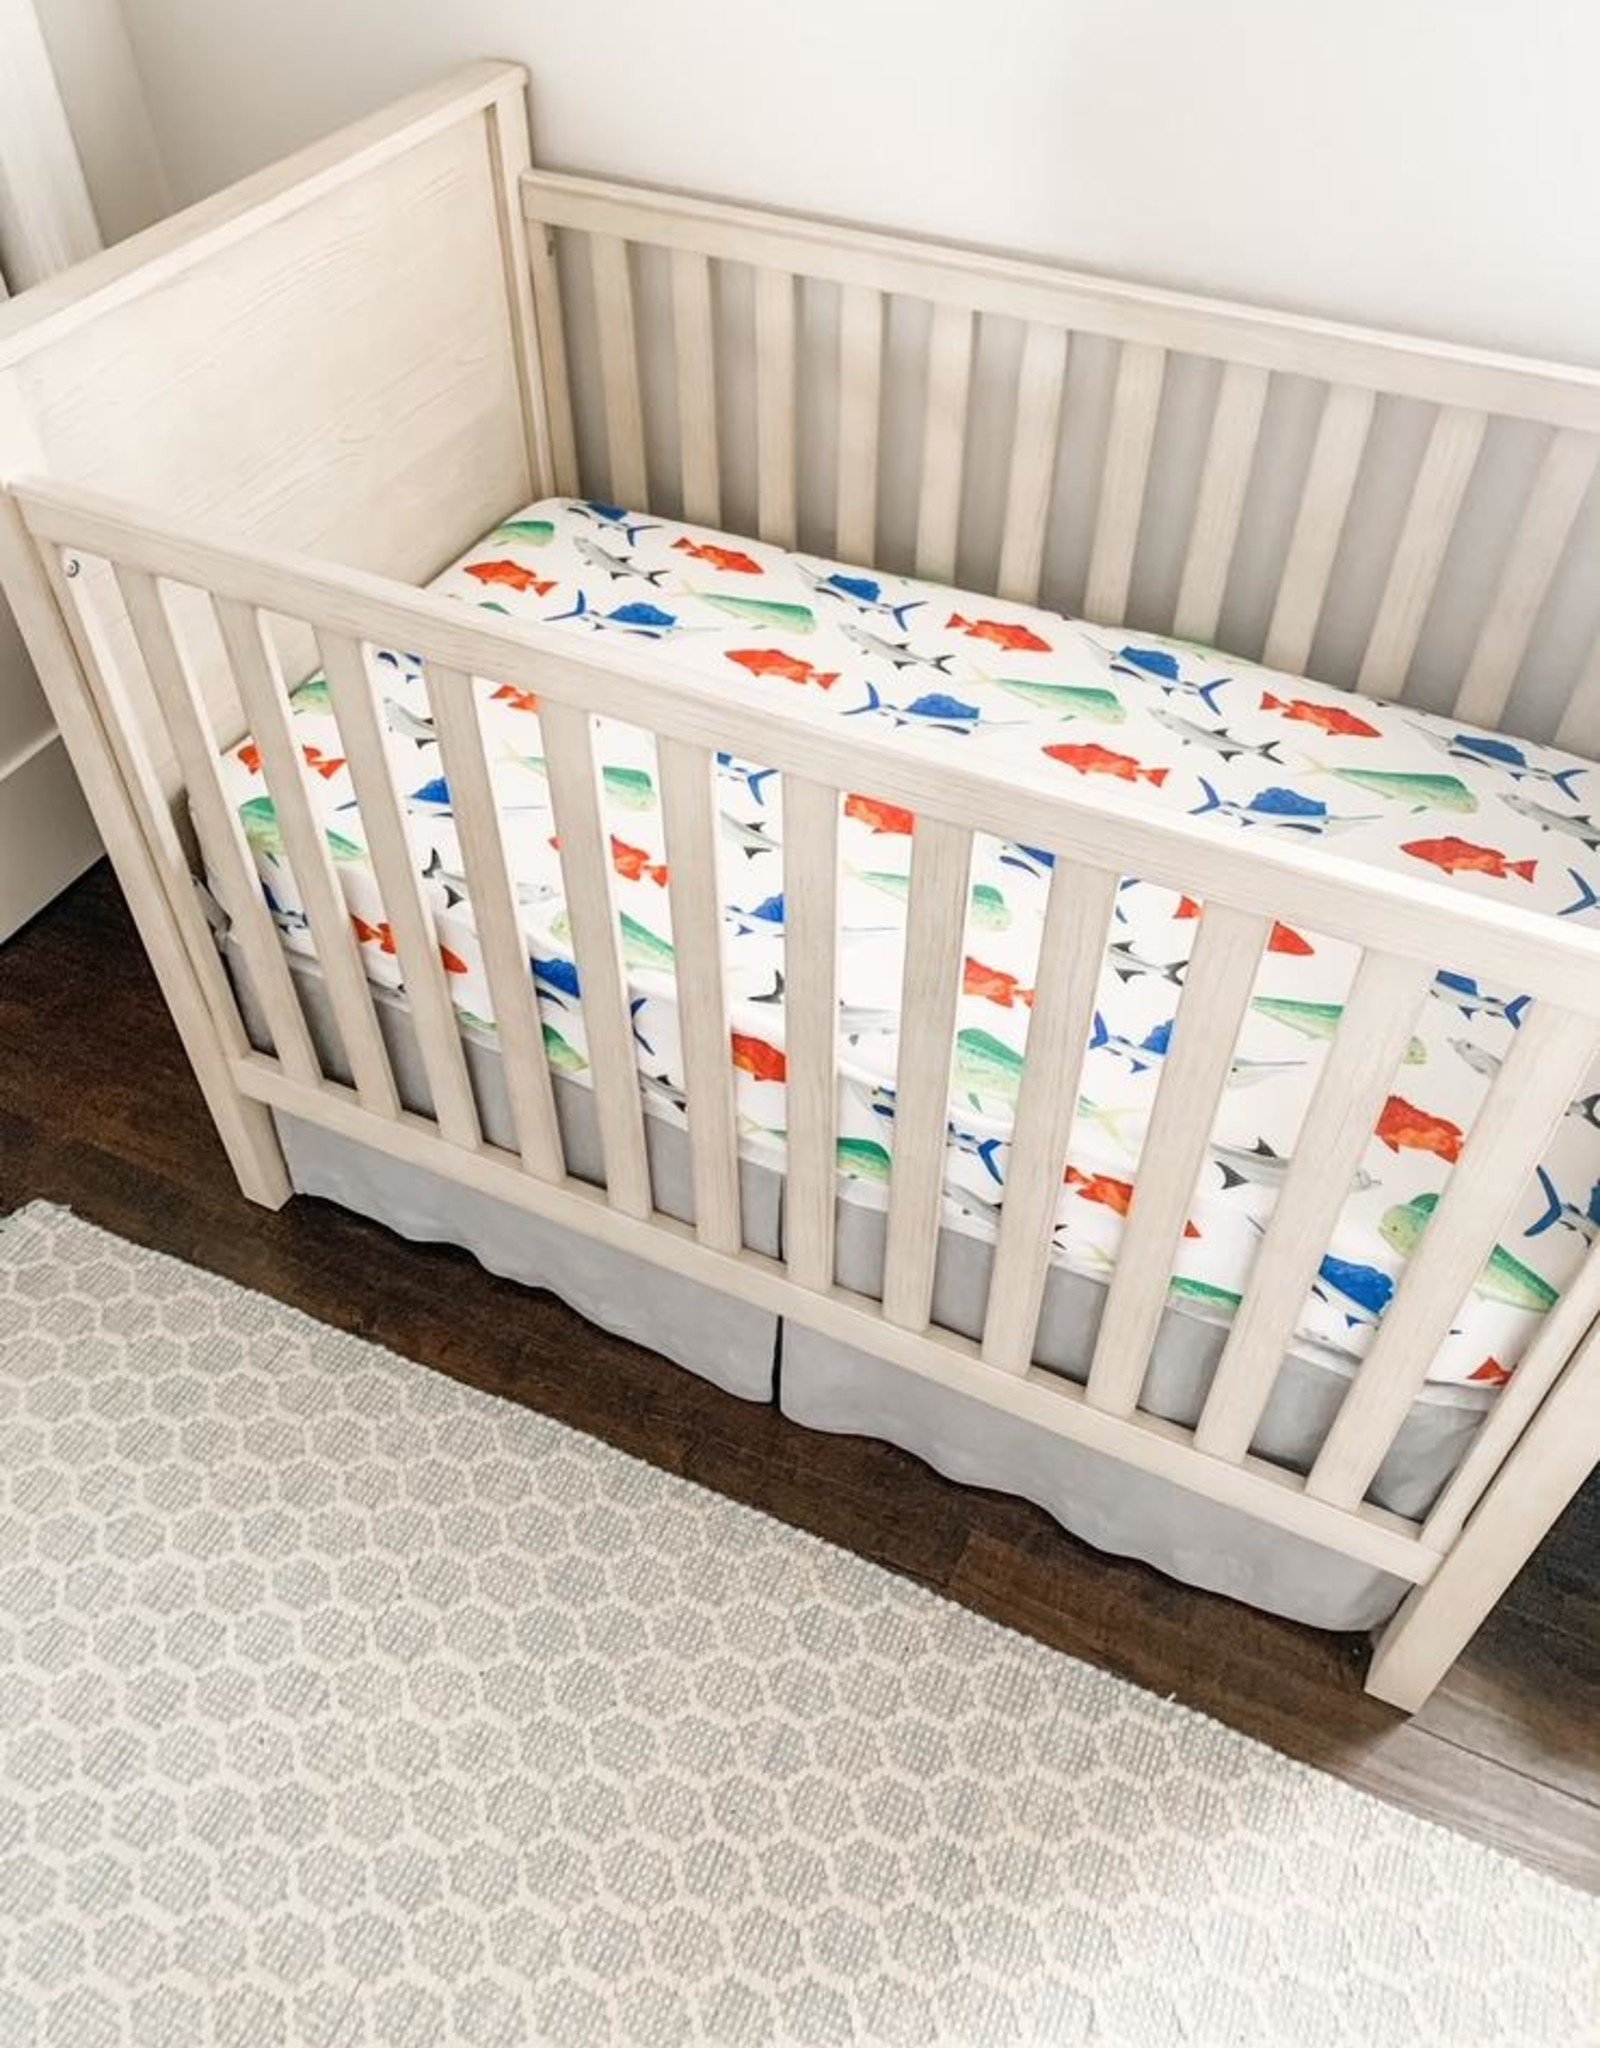 Florida Kid Co. Fish Crib Sheet